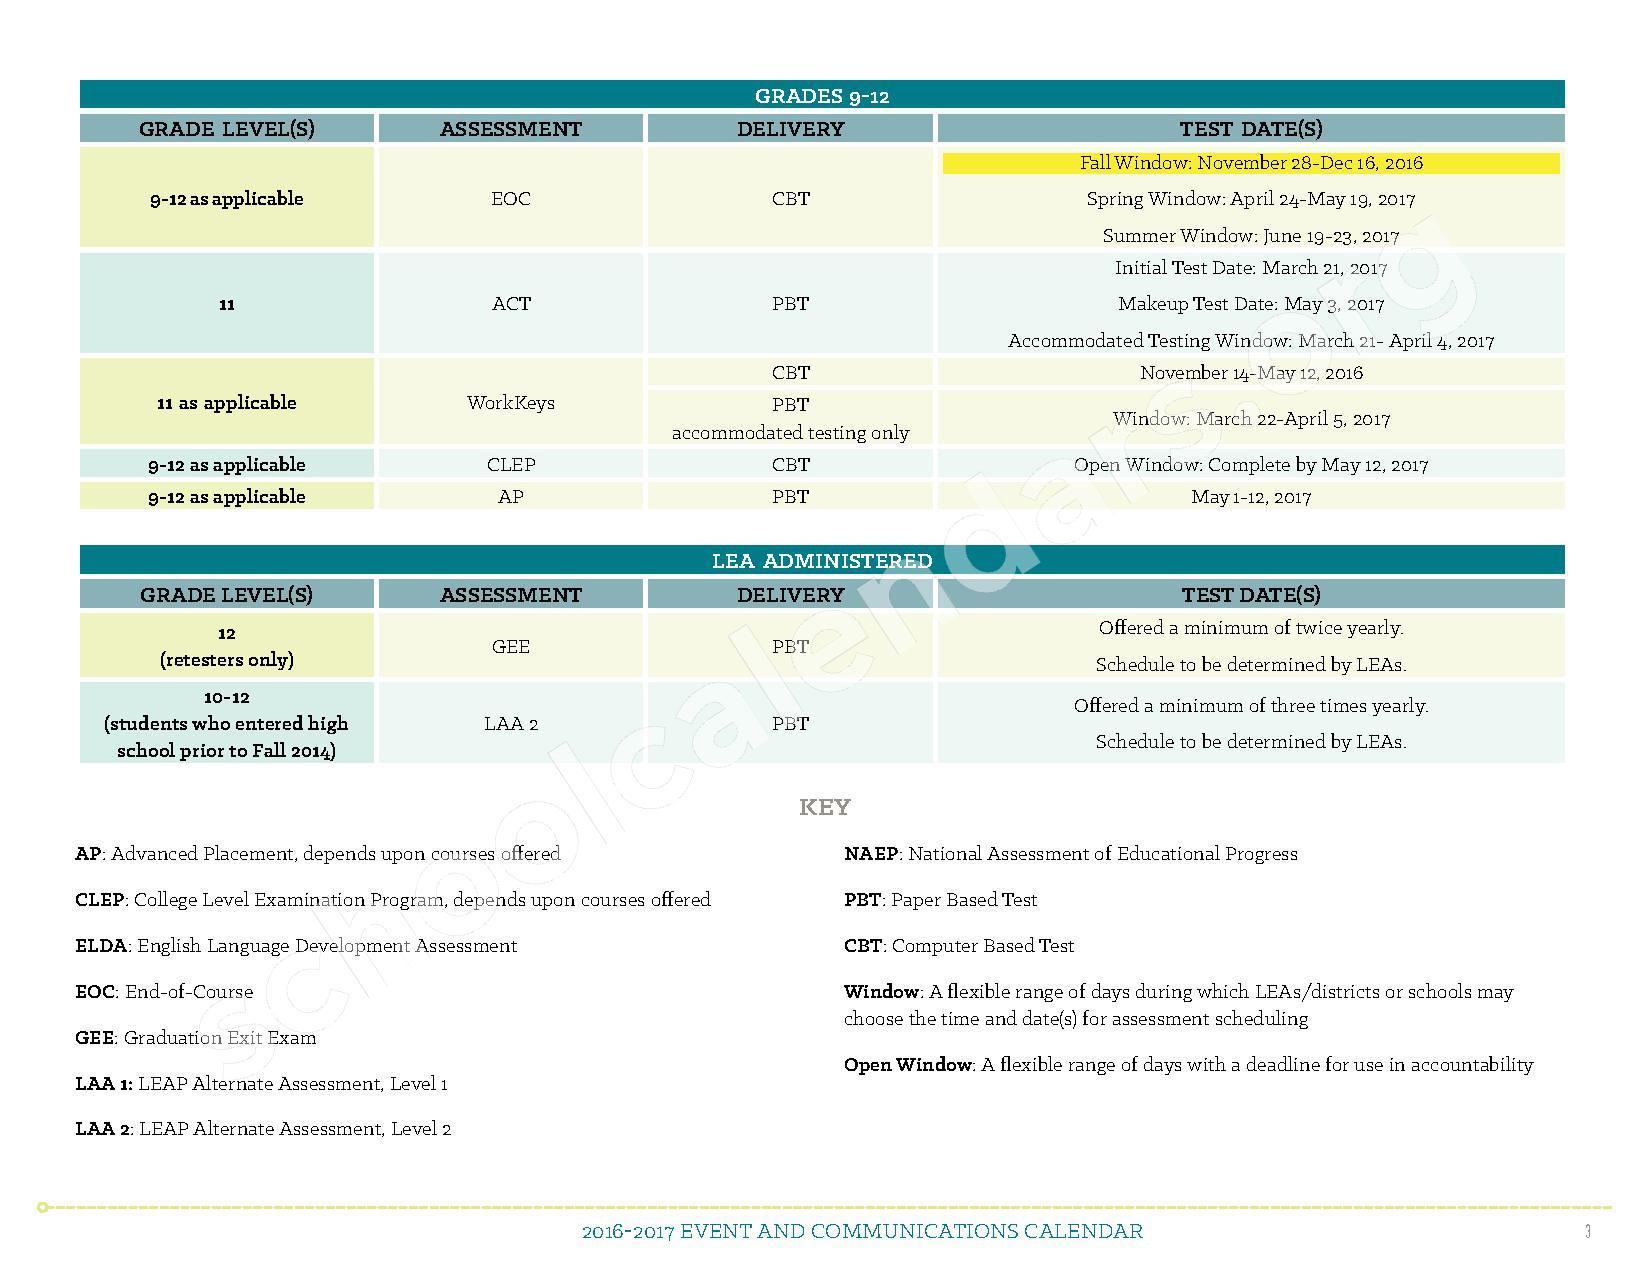 2016 - 2017 Louisiana Assessment Calendar – Alma Redwine Elementary New Vision Academy – page 2